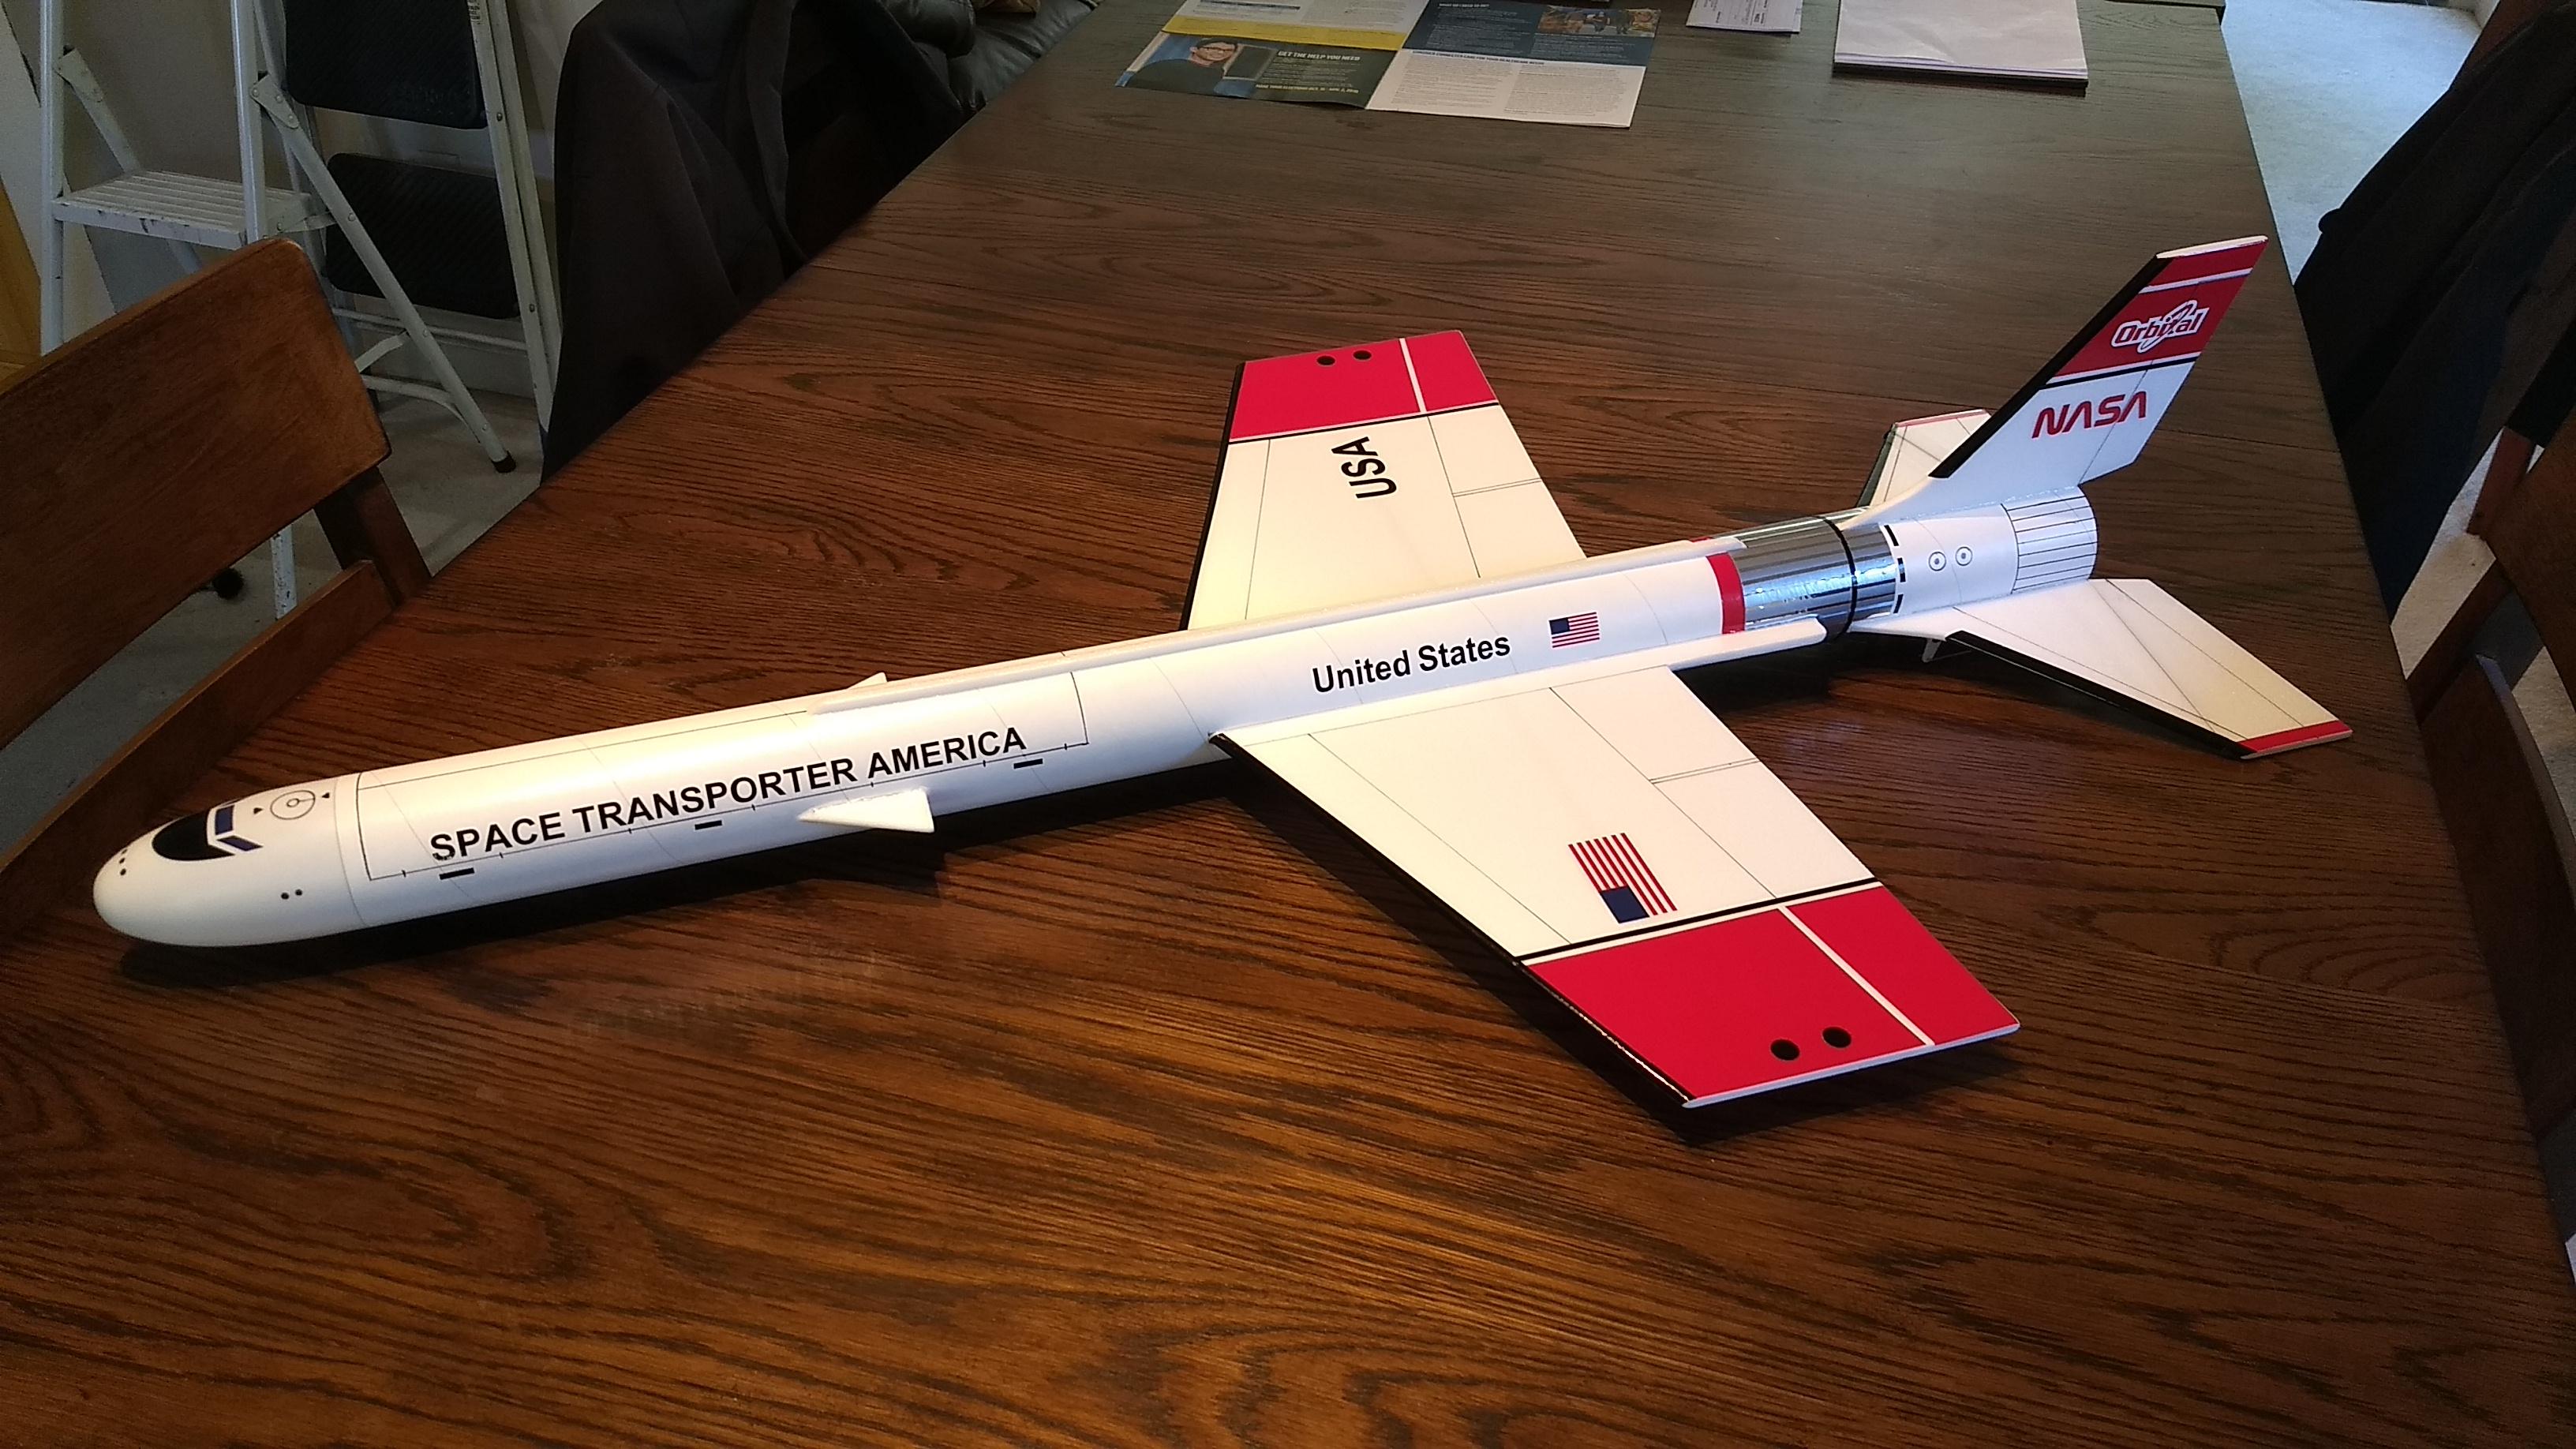 Radio Controlled Rocket Glider Kits